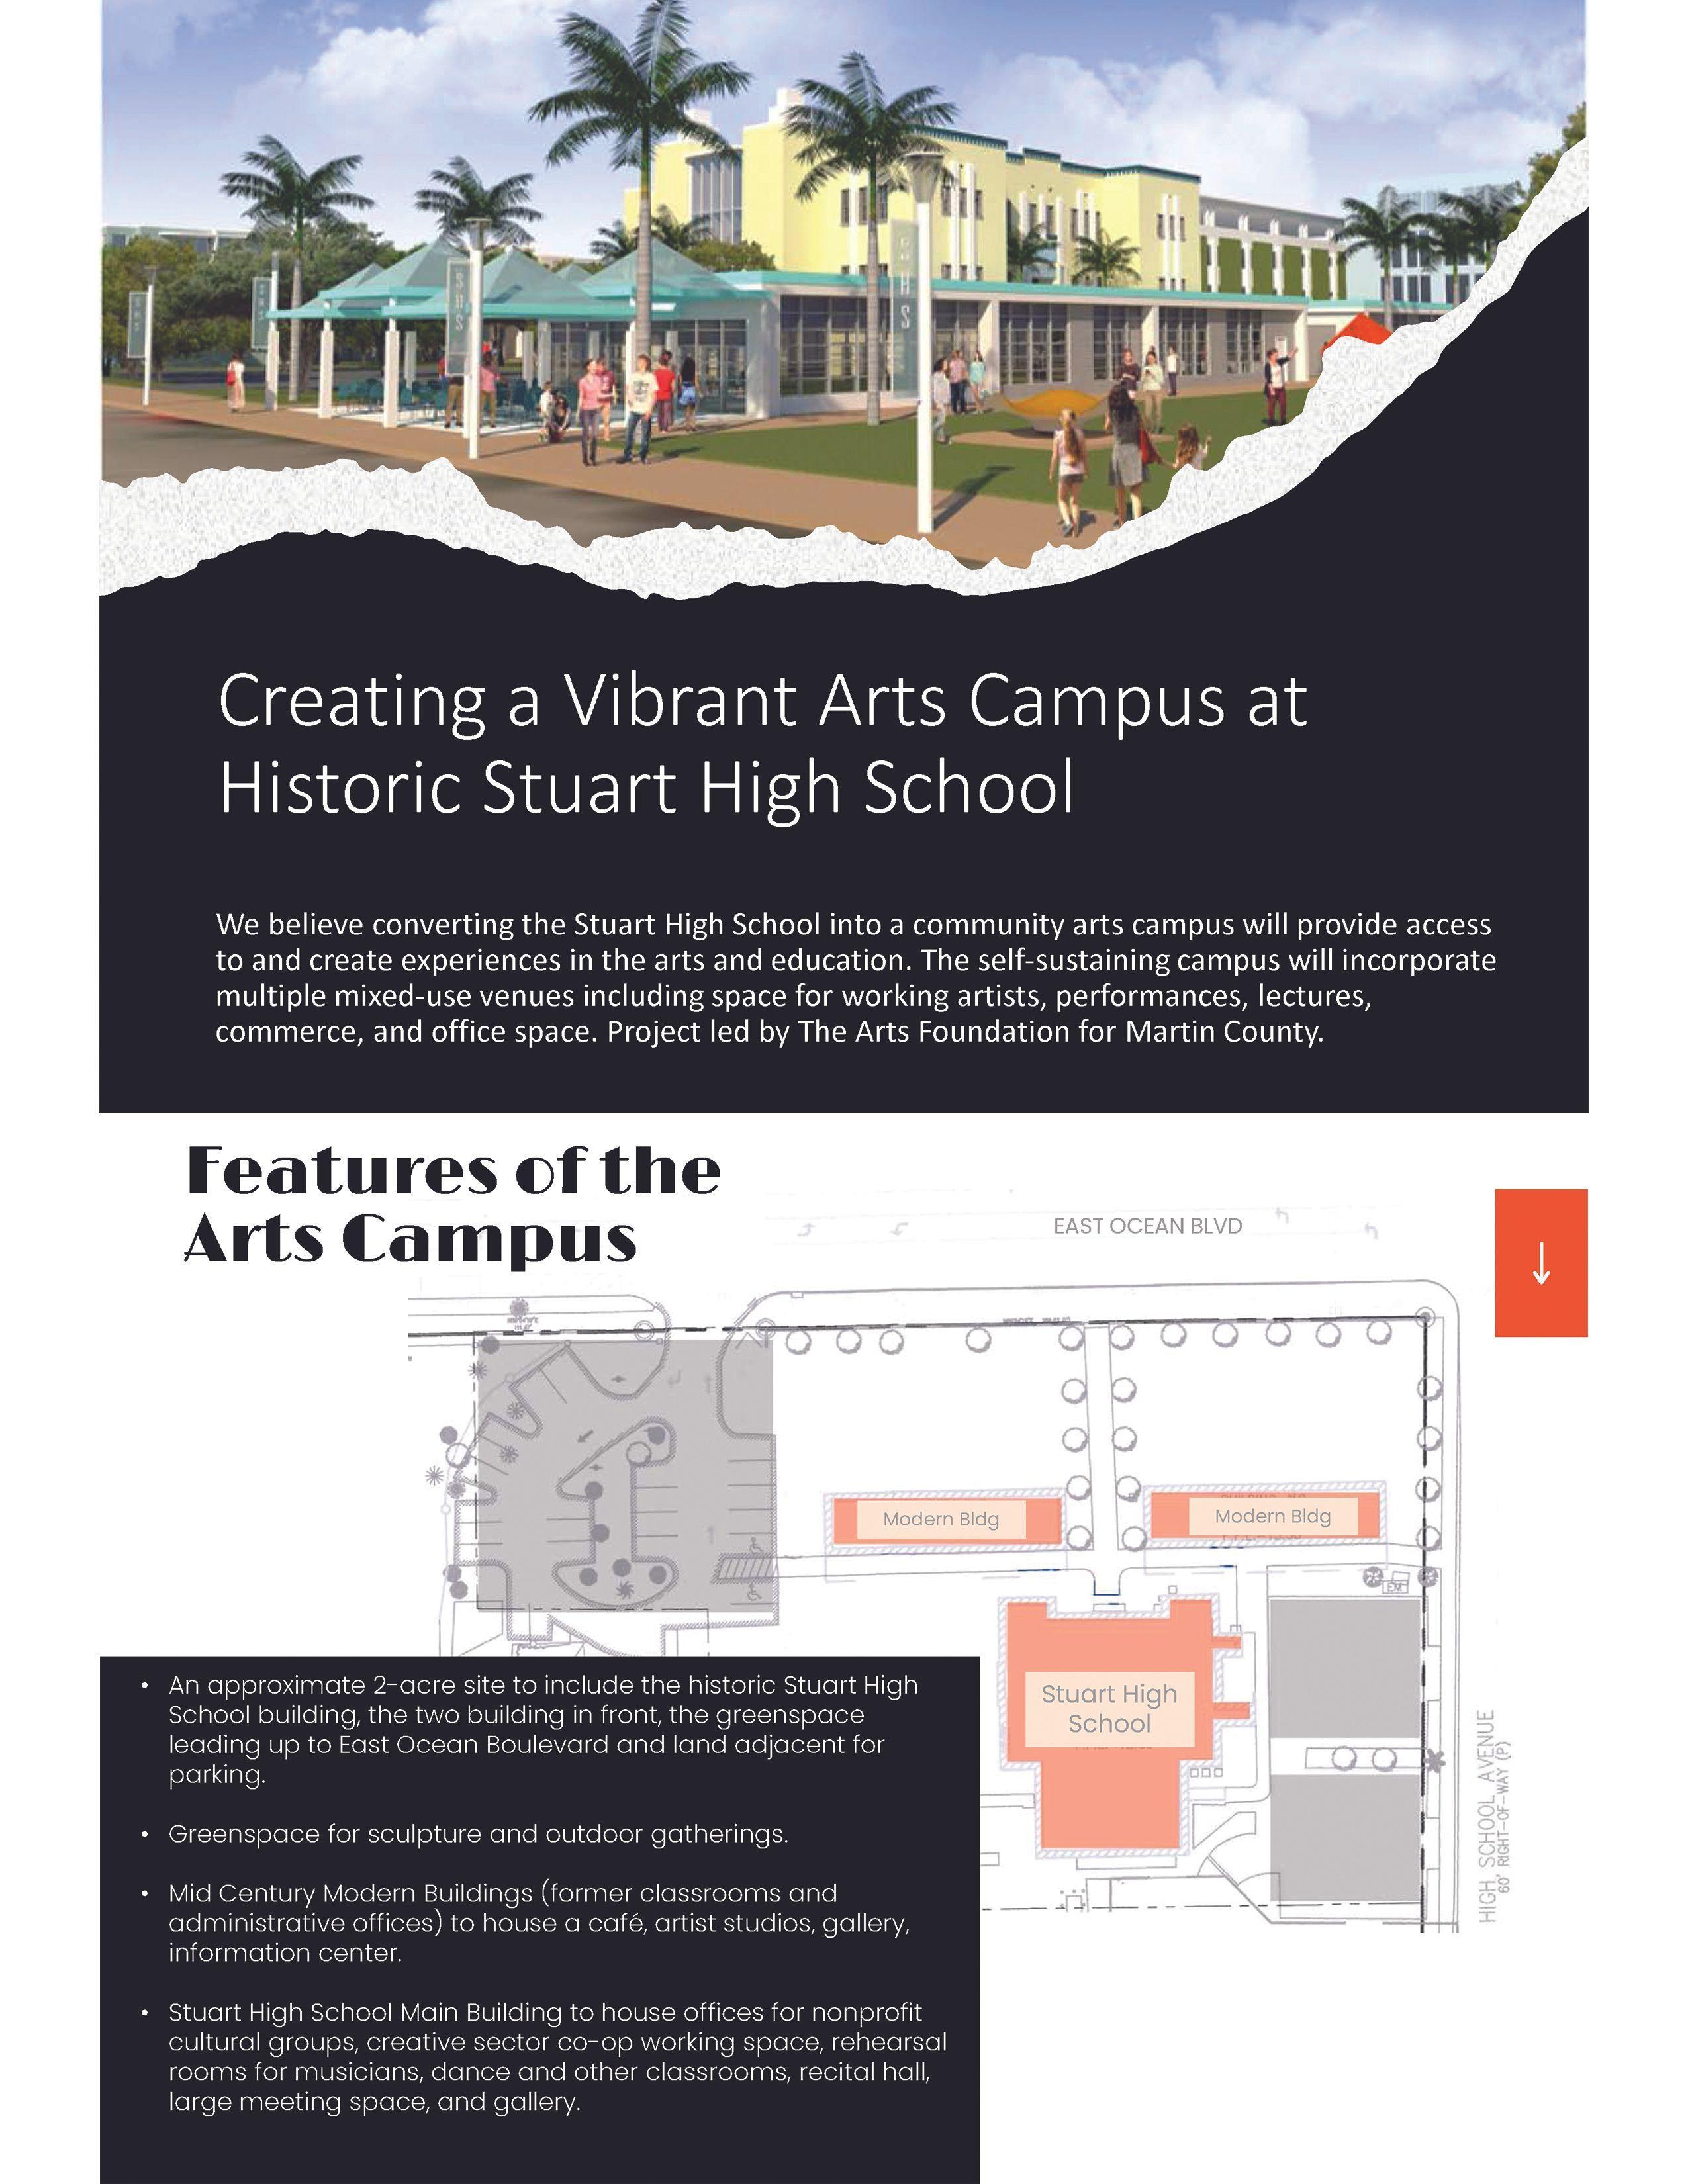 conceptual aerial view of the Stuart High School arts campus